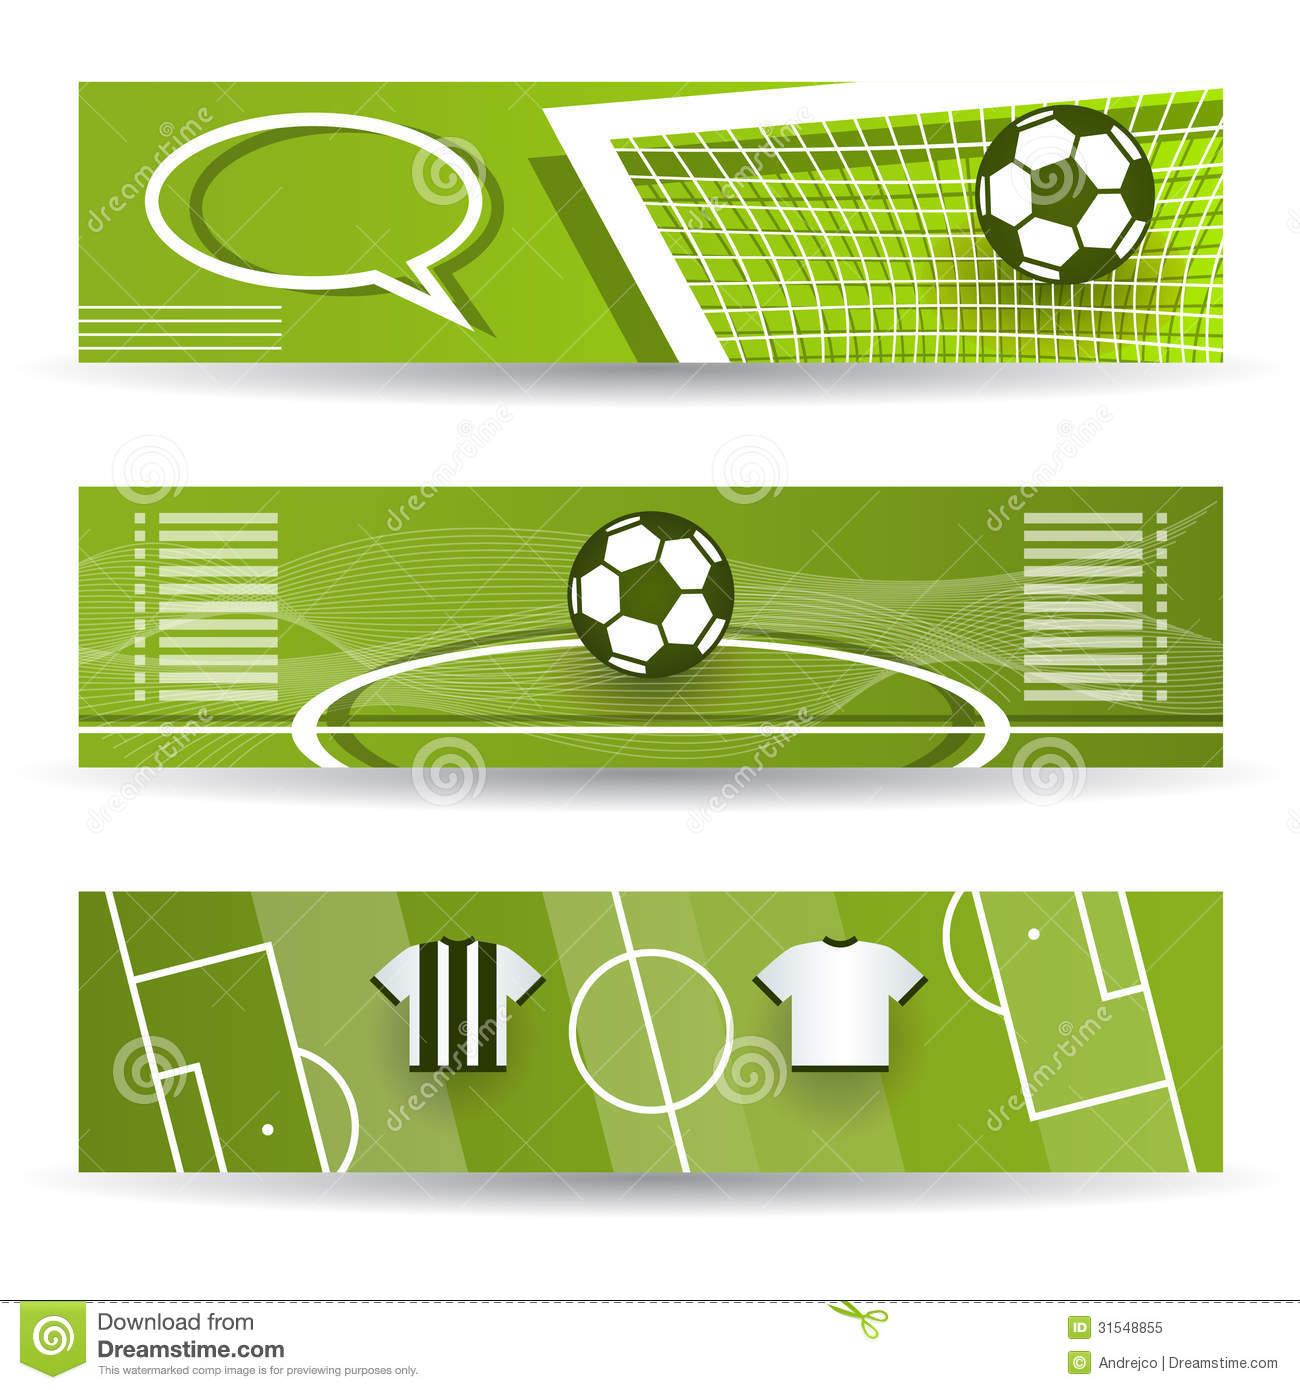 Royalty Free Images Soccer Banner